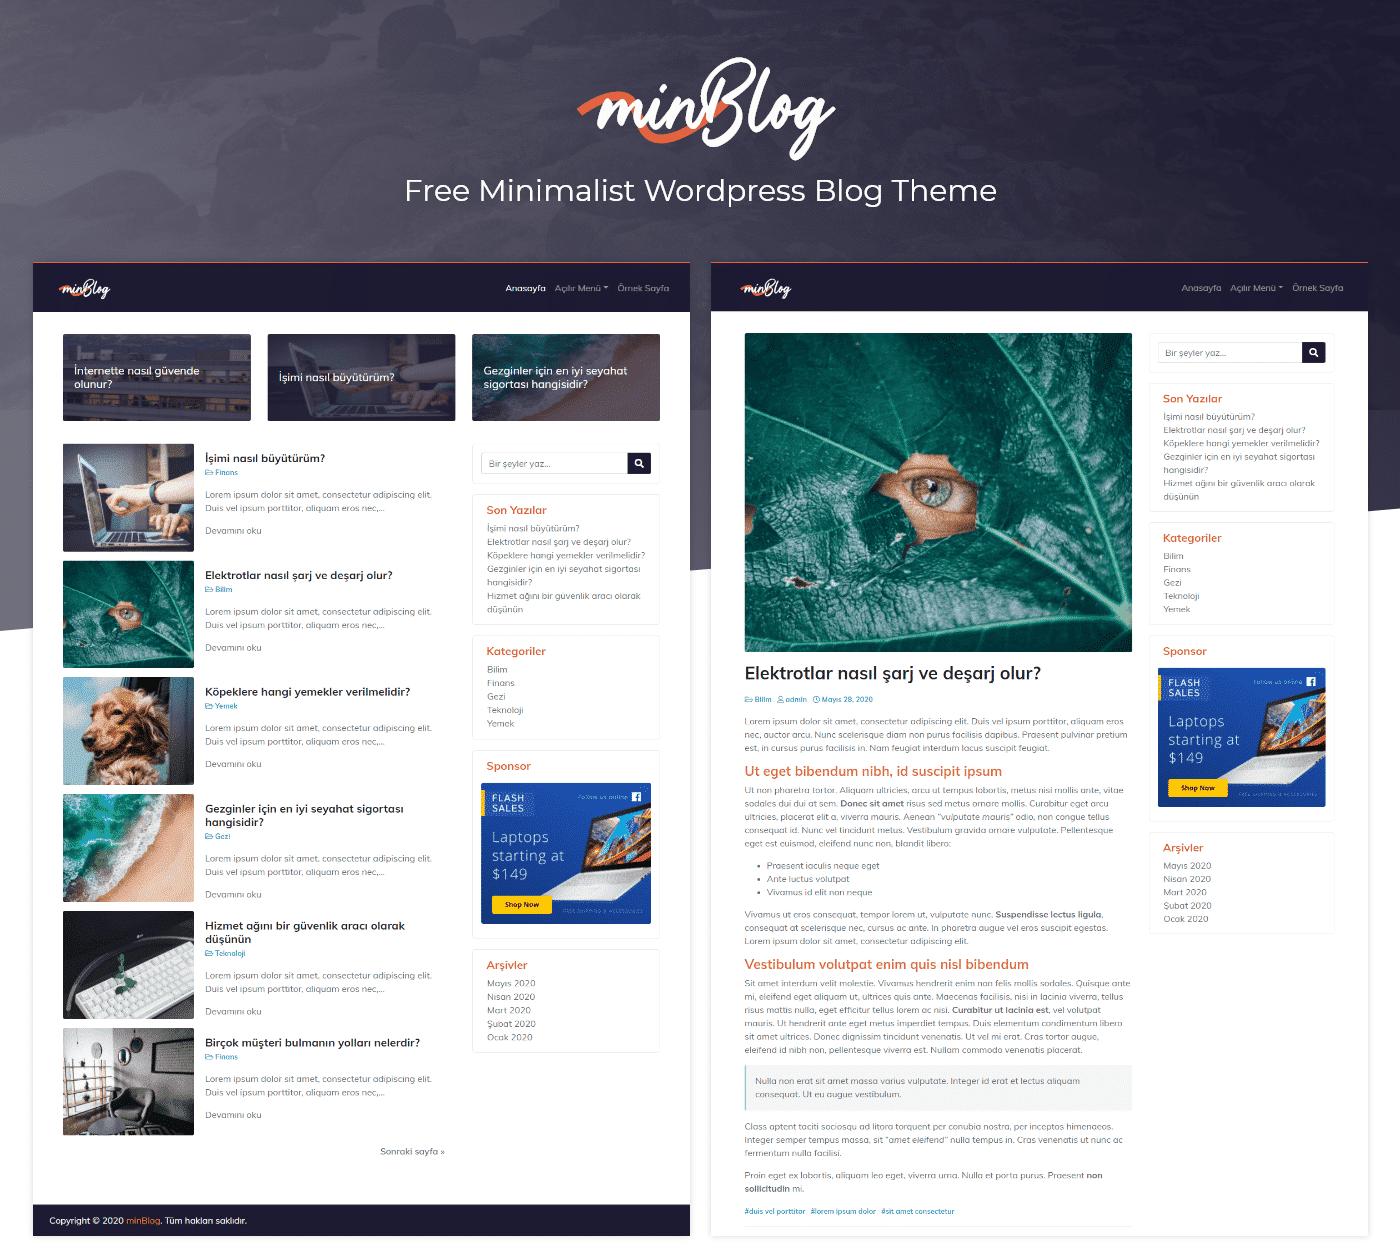 minBlog – Free Minimalist WordPress Blog Theme